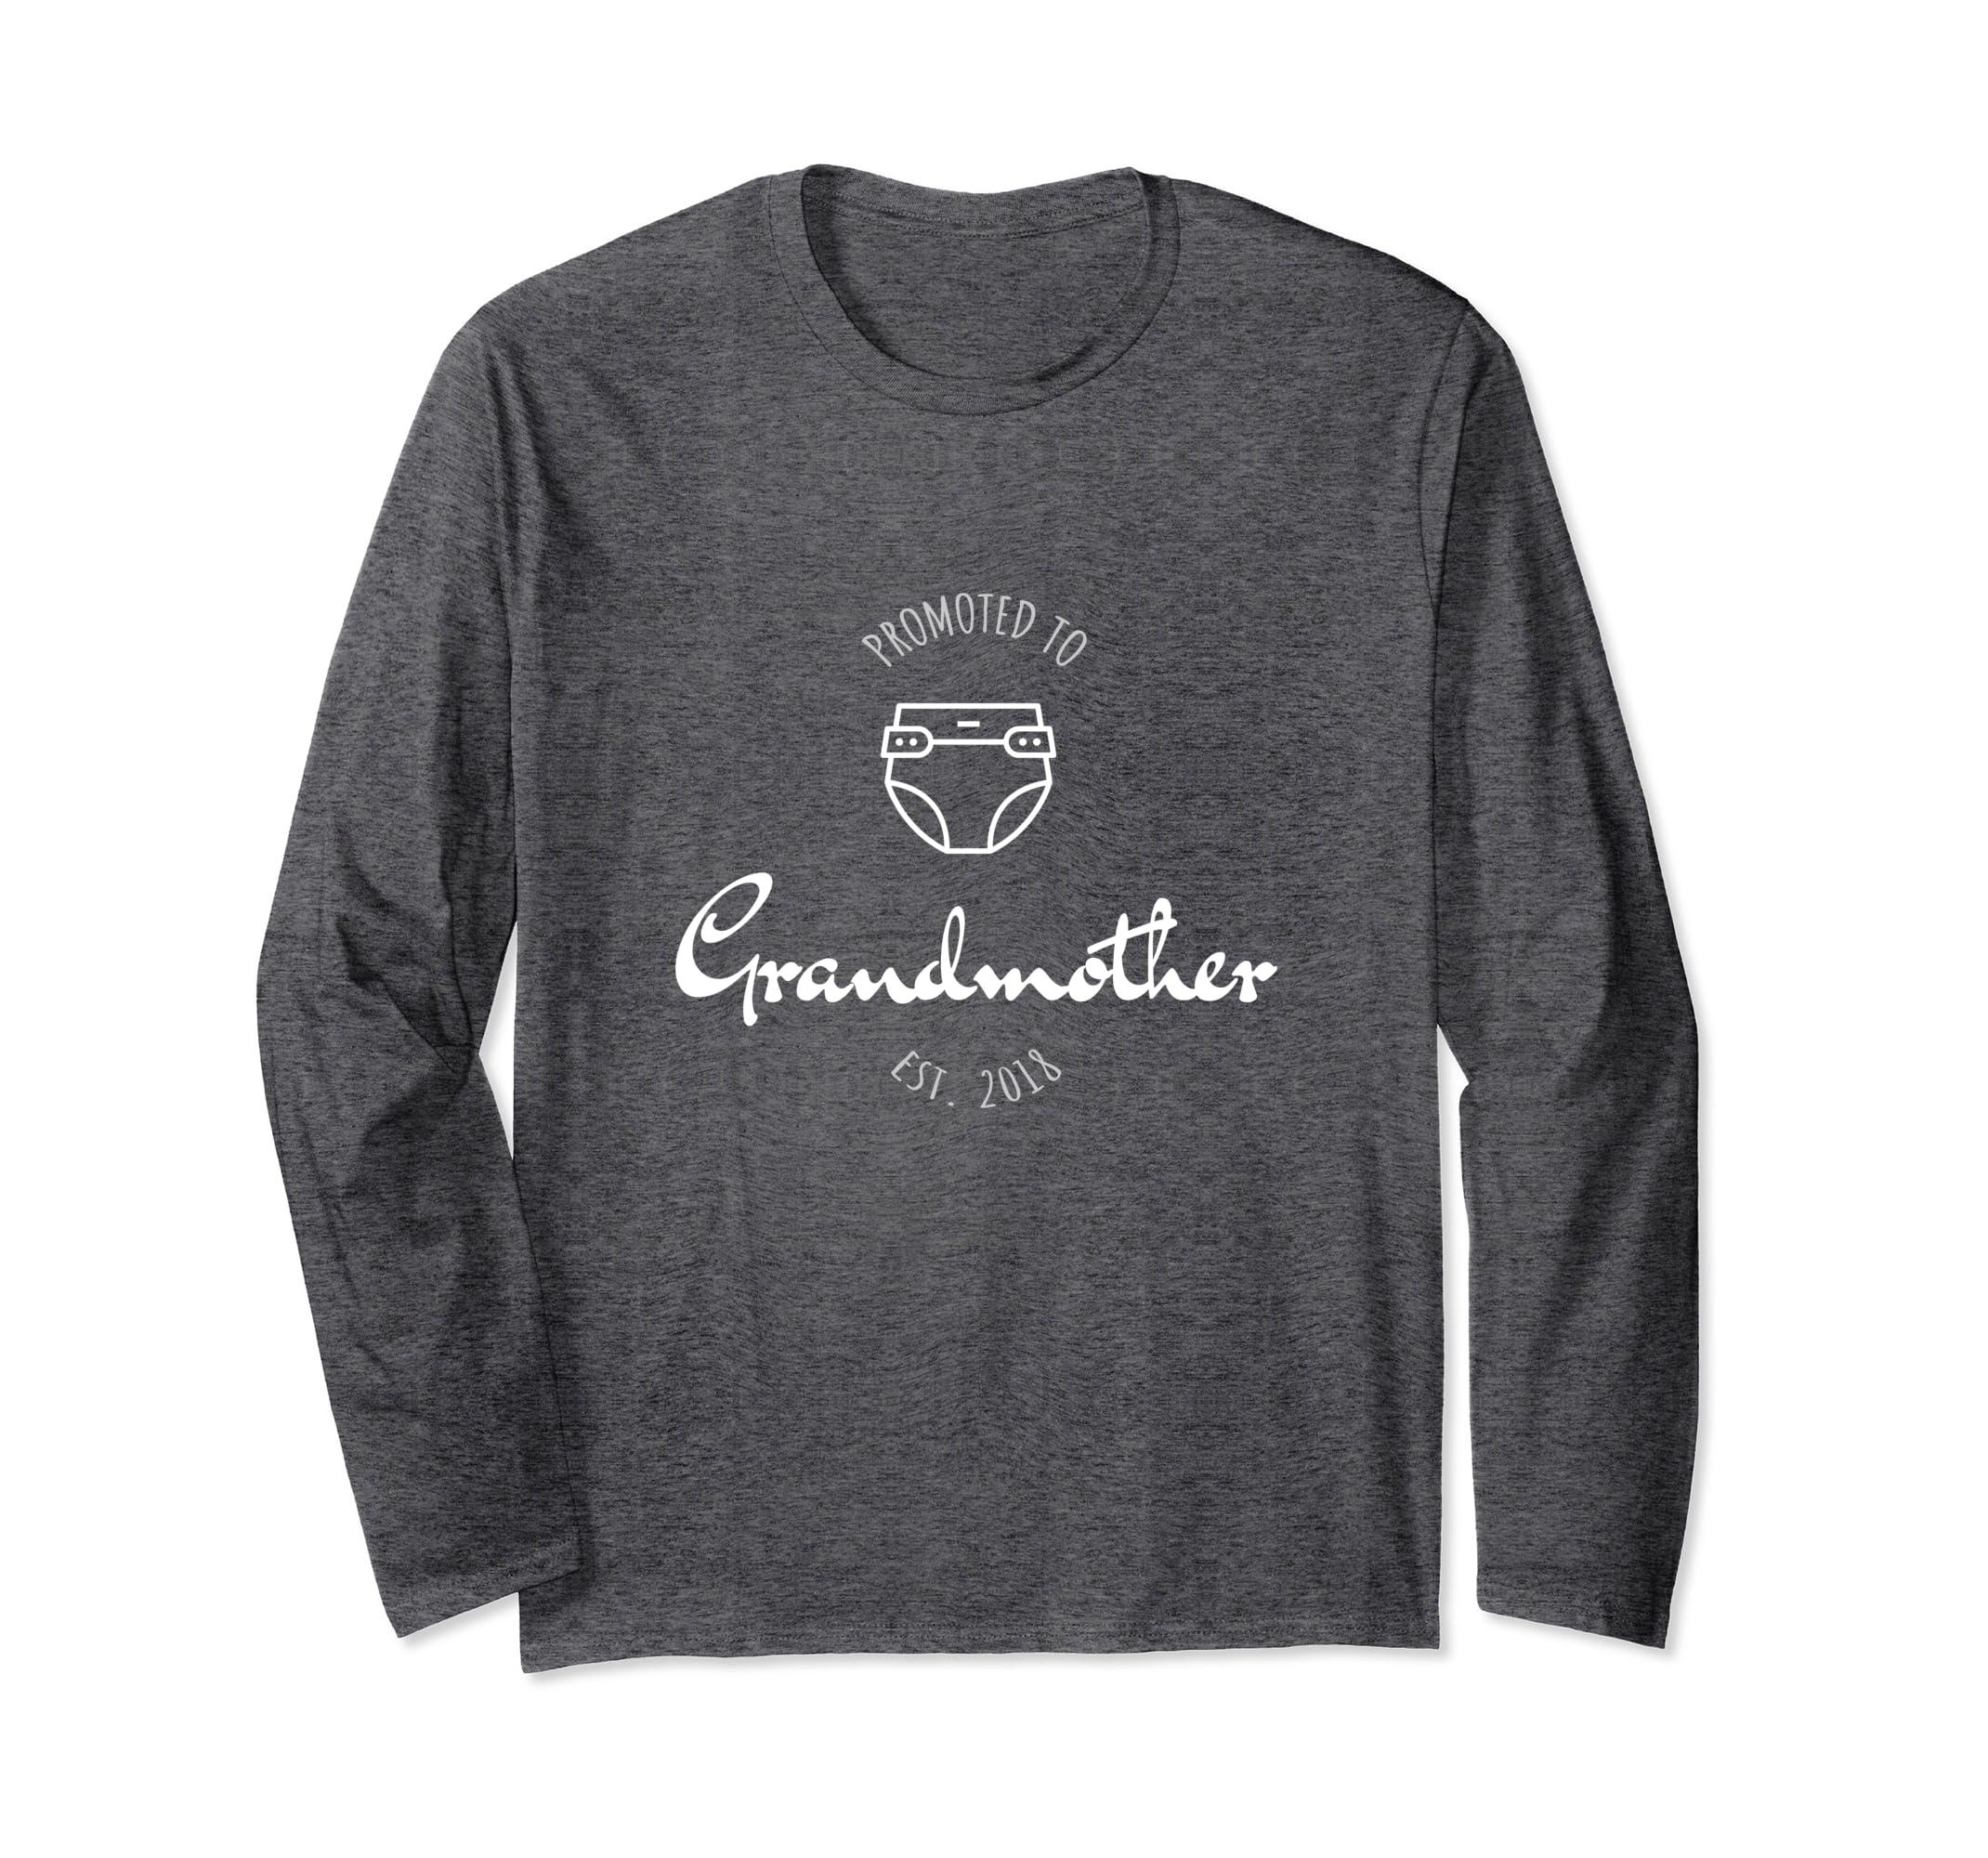 3bcbf8e4 Amazon.com: Promoted to Grandmother EST 2018 Grandma Long Sleeve T-shirt:  Clothing